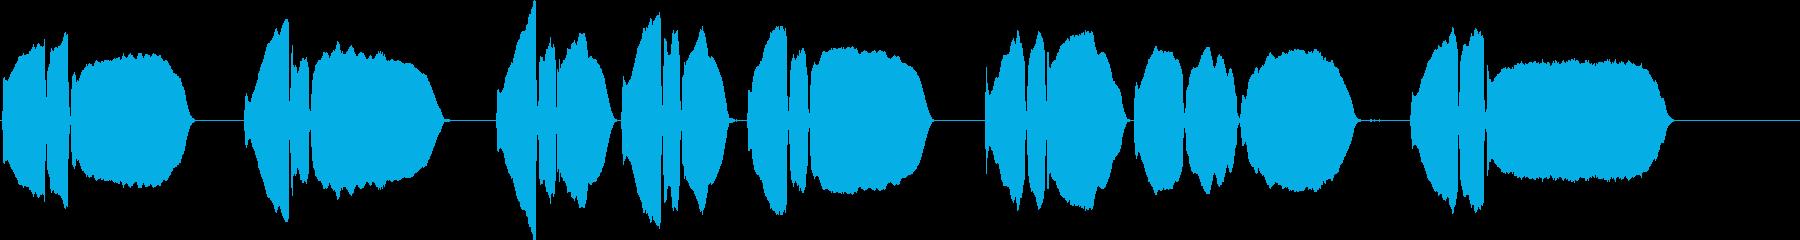 Bugle PlaysΓÇÿtap...の再生済みの波形